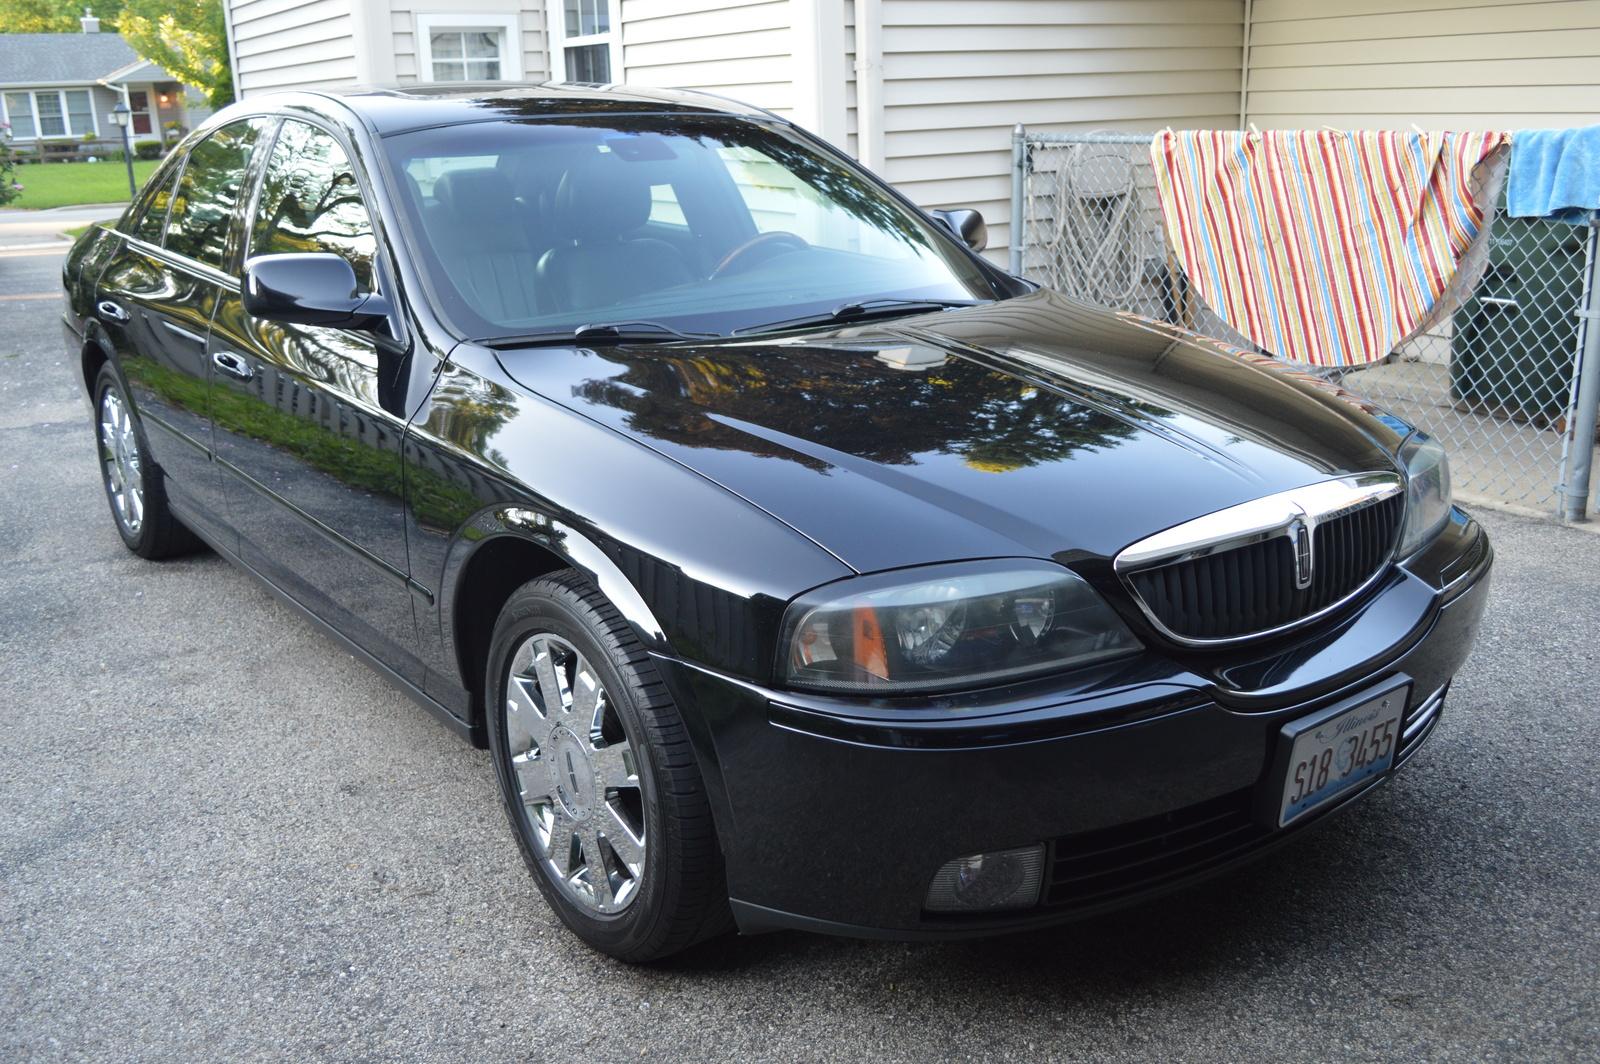 2003 Lincoln Ls Pictures Cargurus